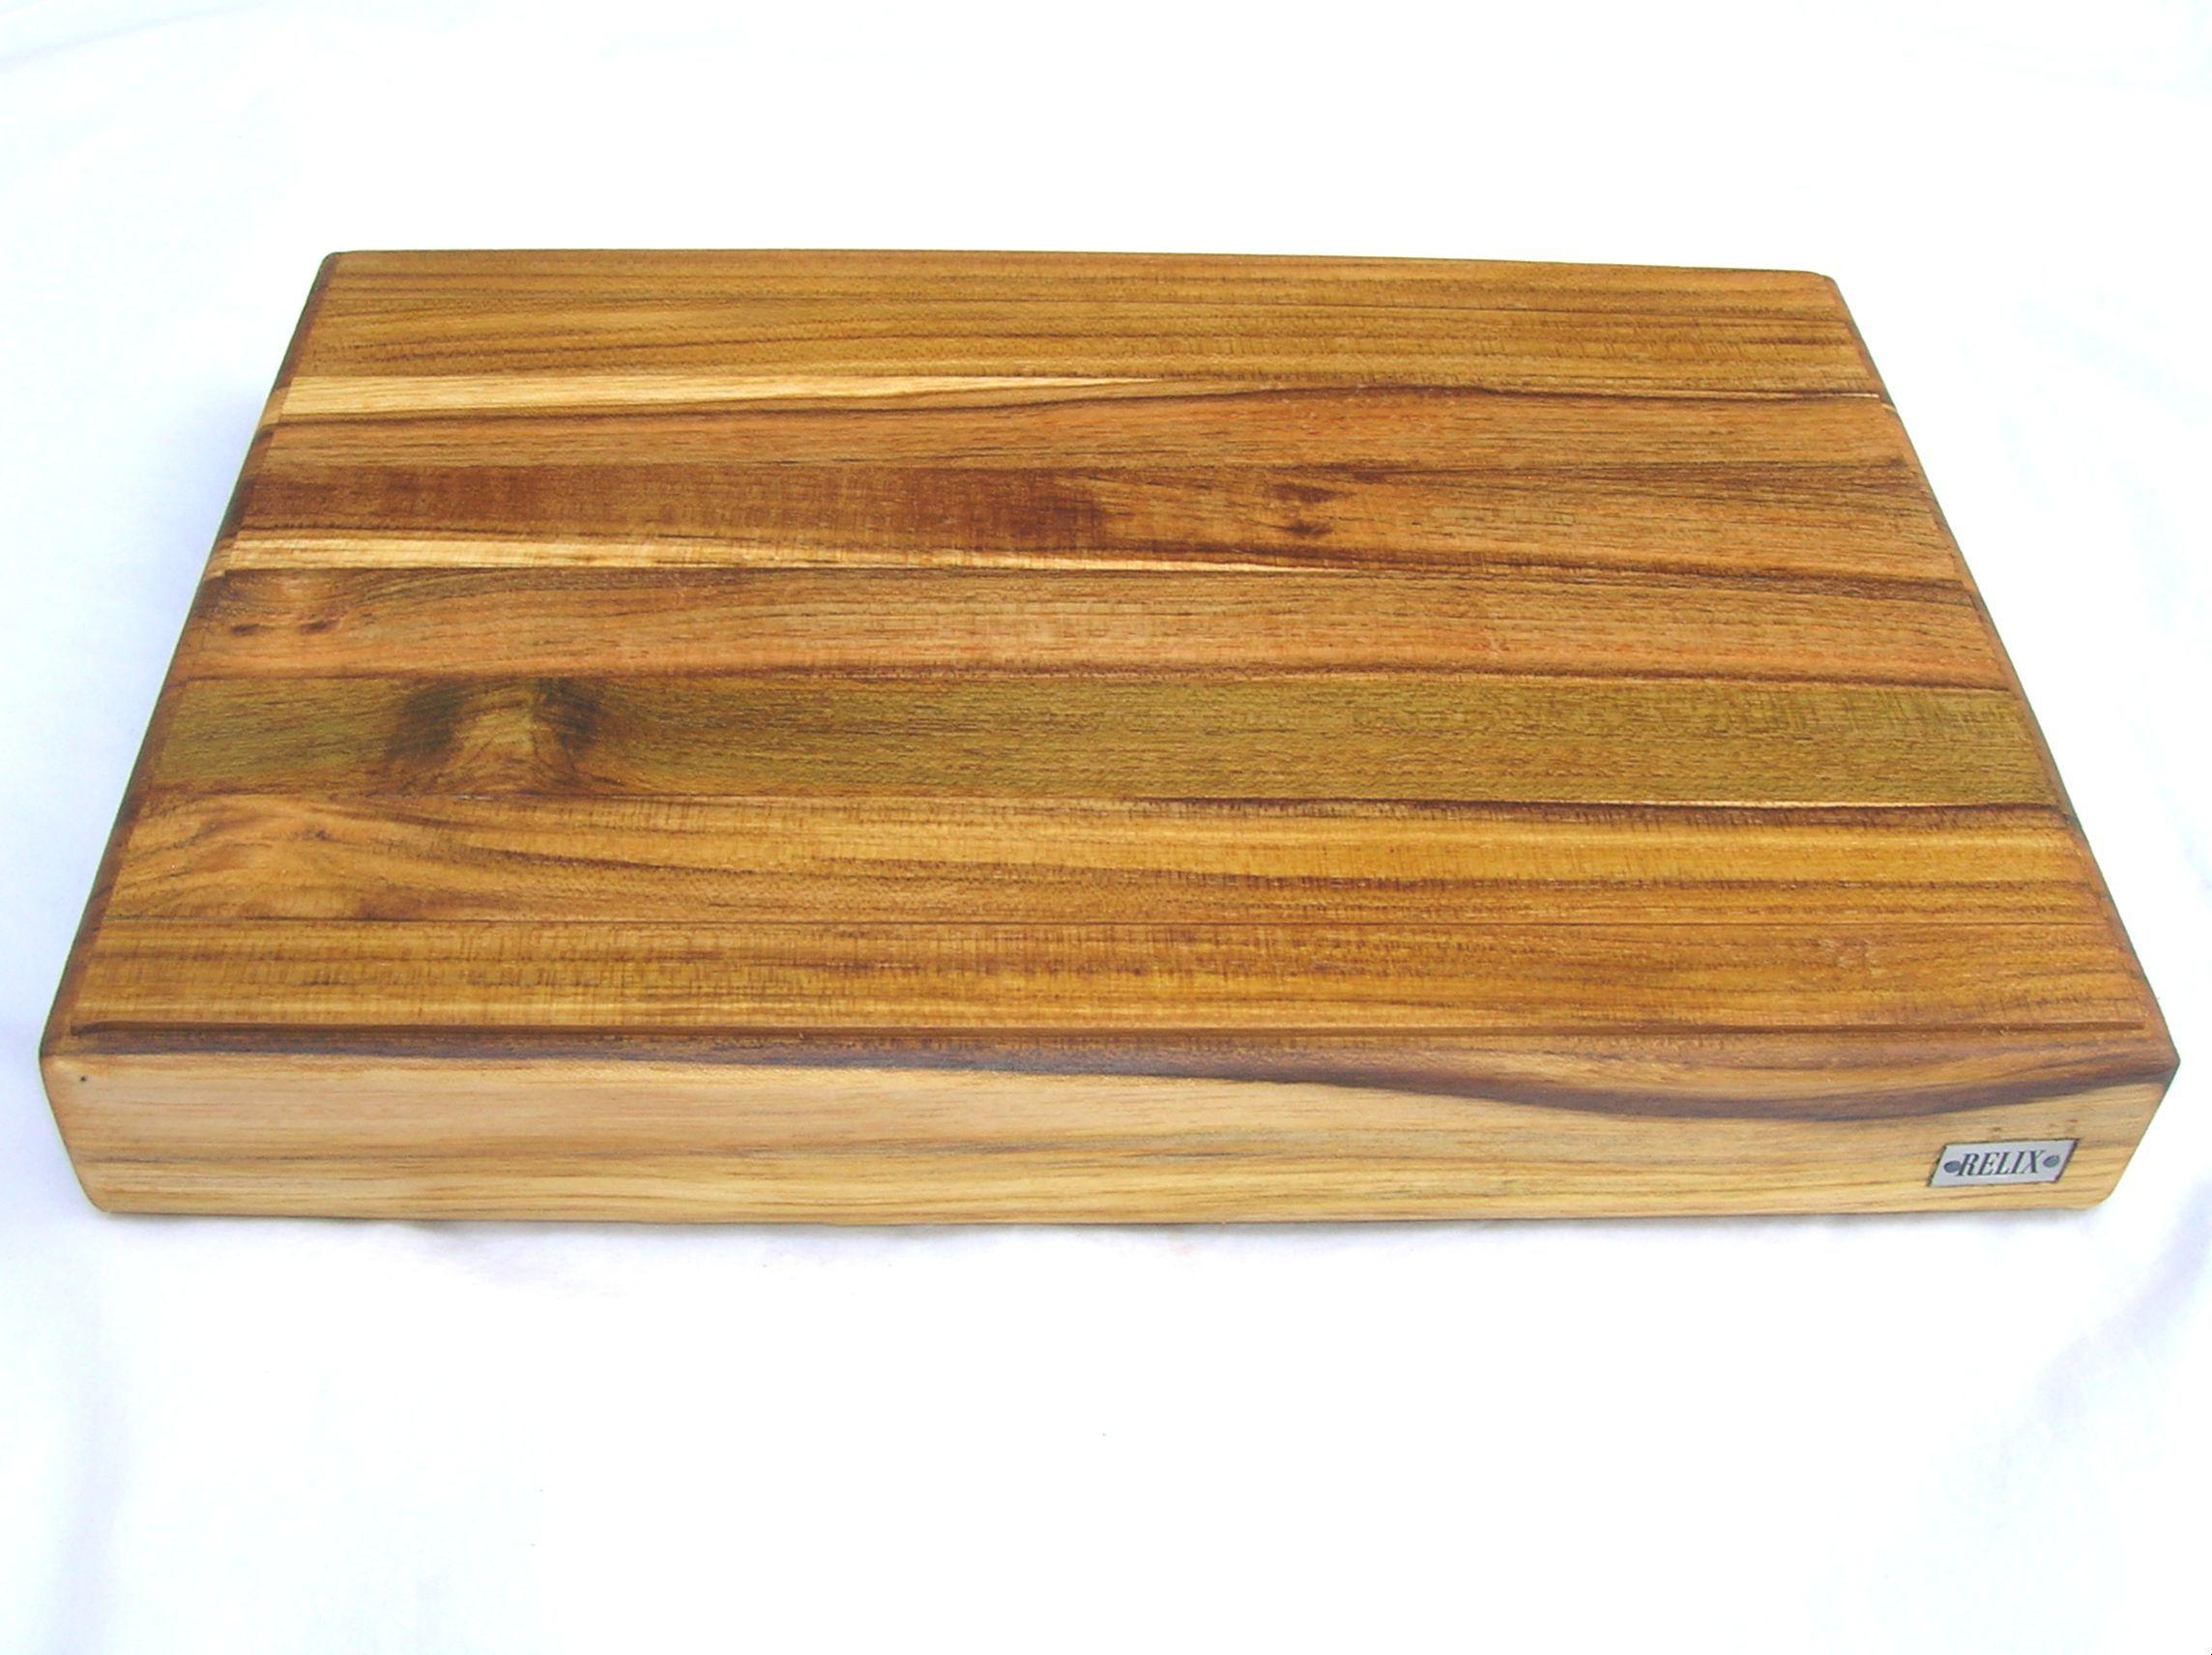 Relix Teak02 Cutting Board Wooden